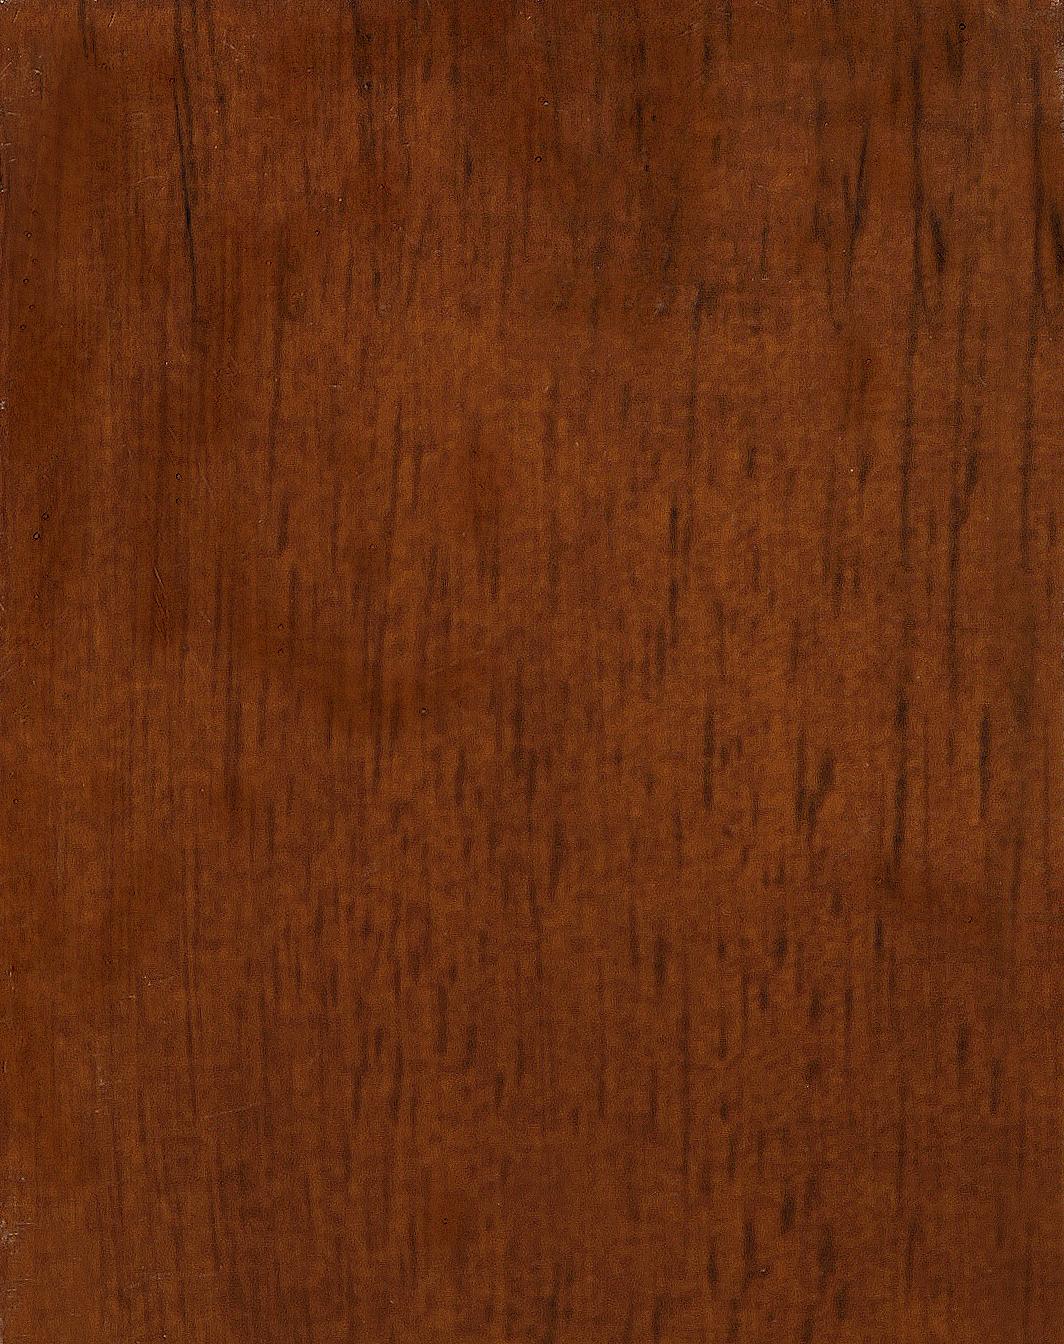 Wood_Oak_Cherry.jpg